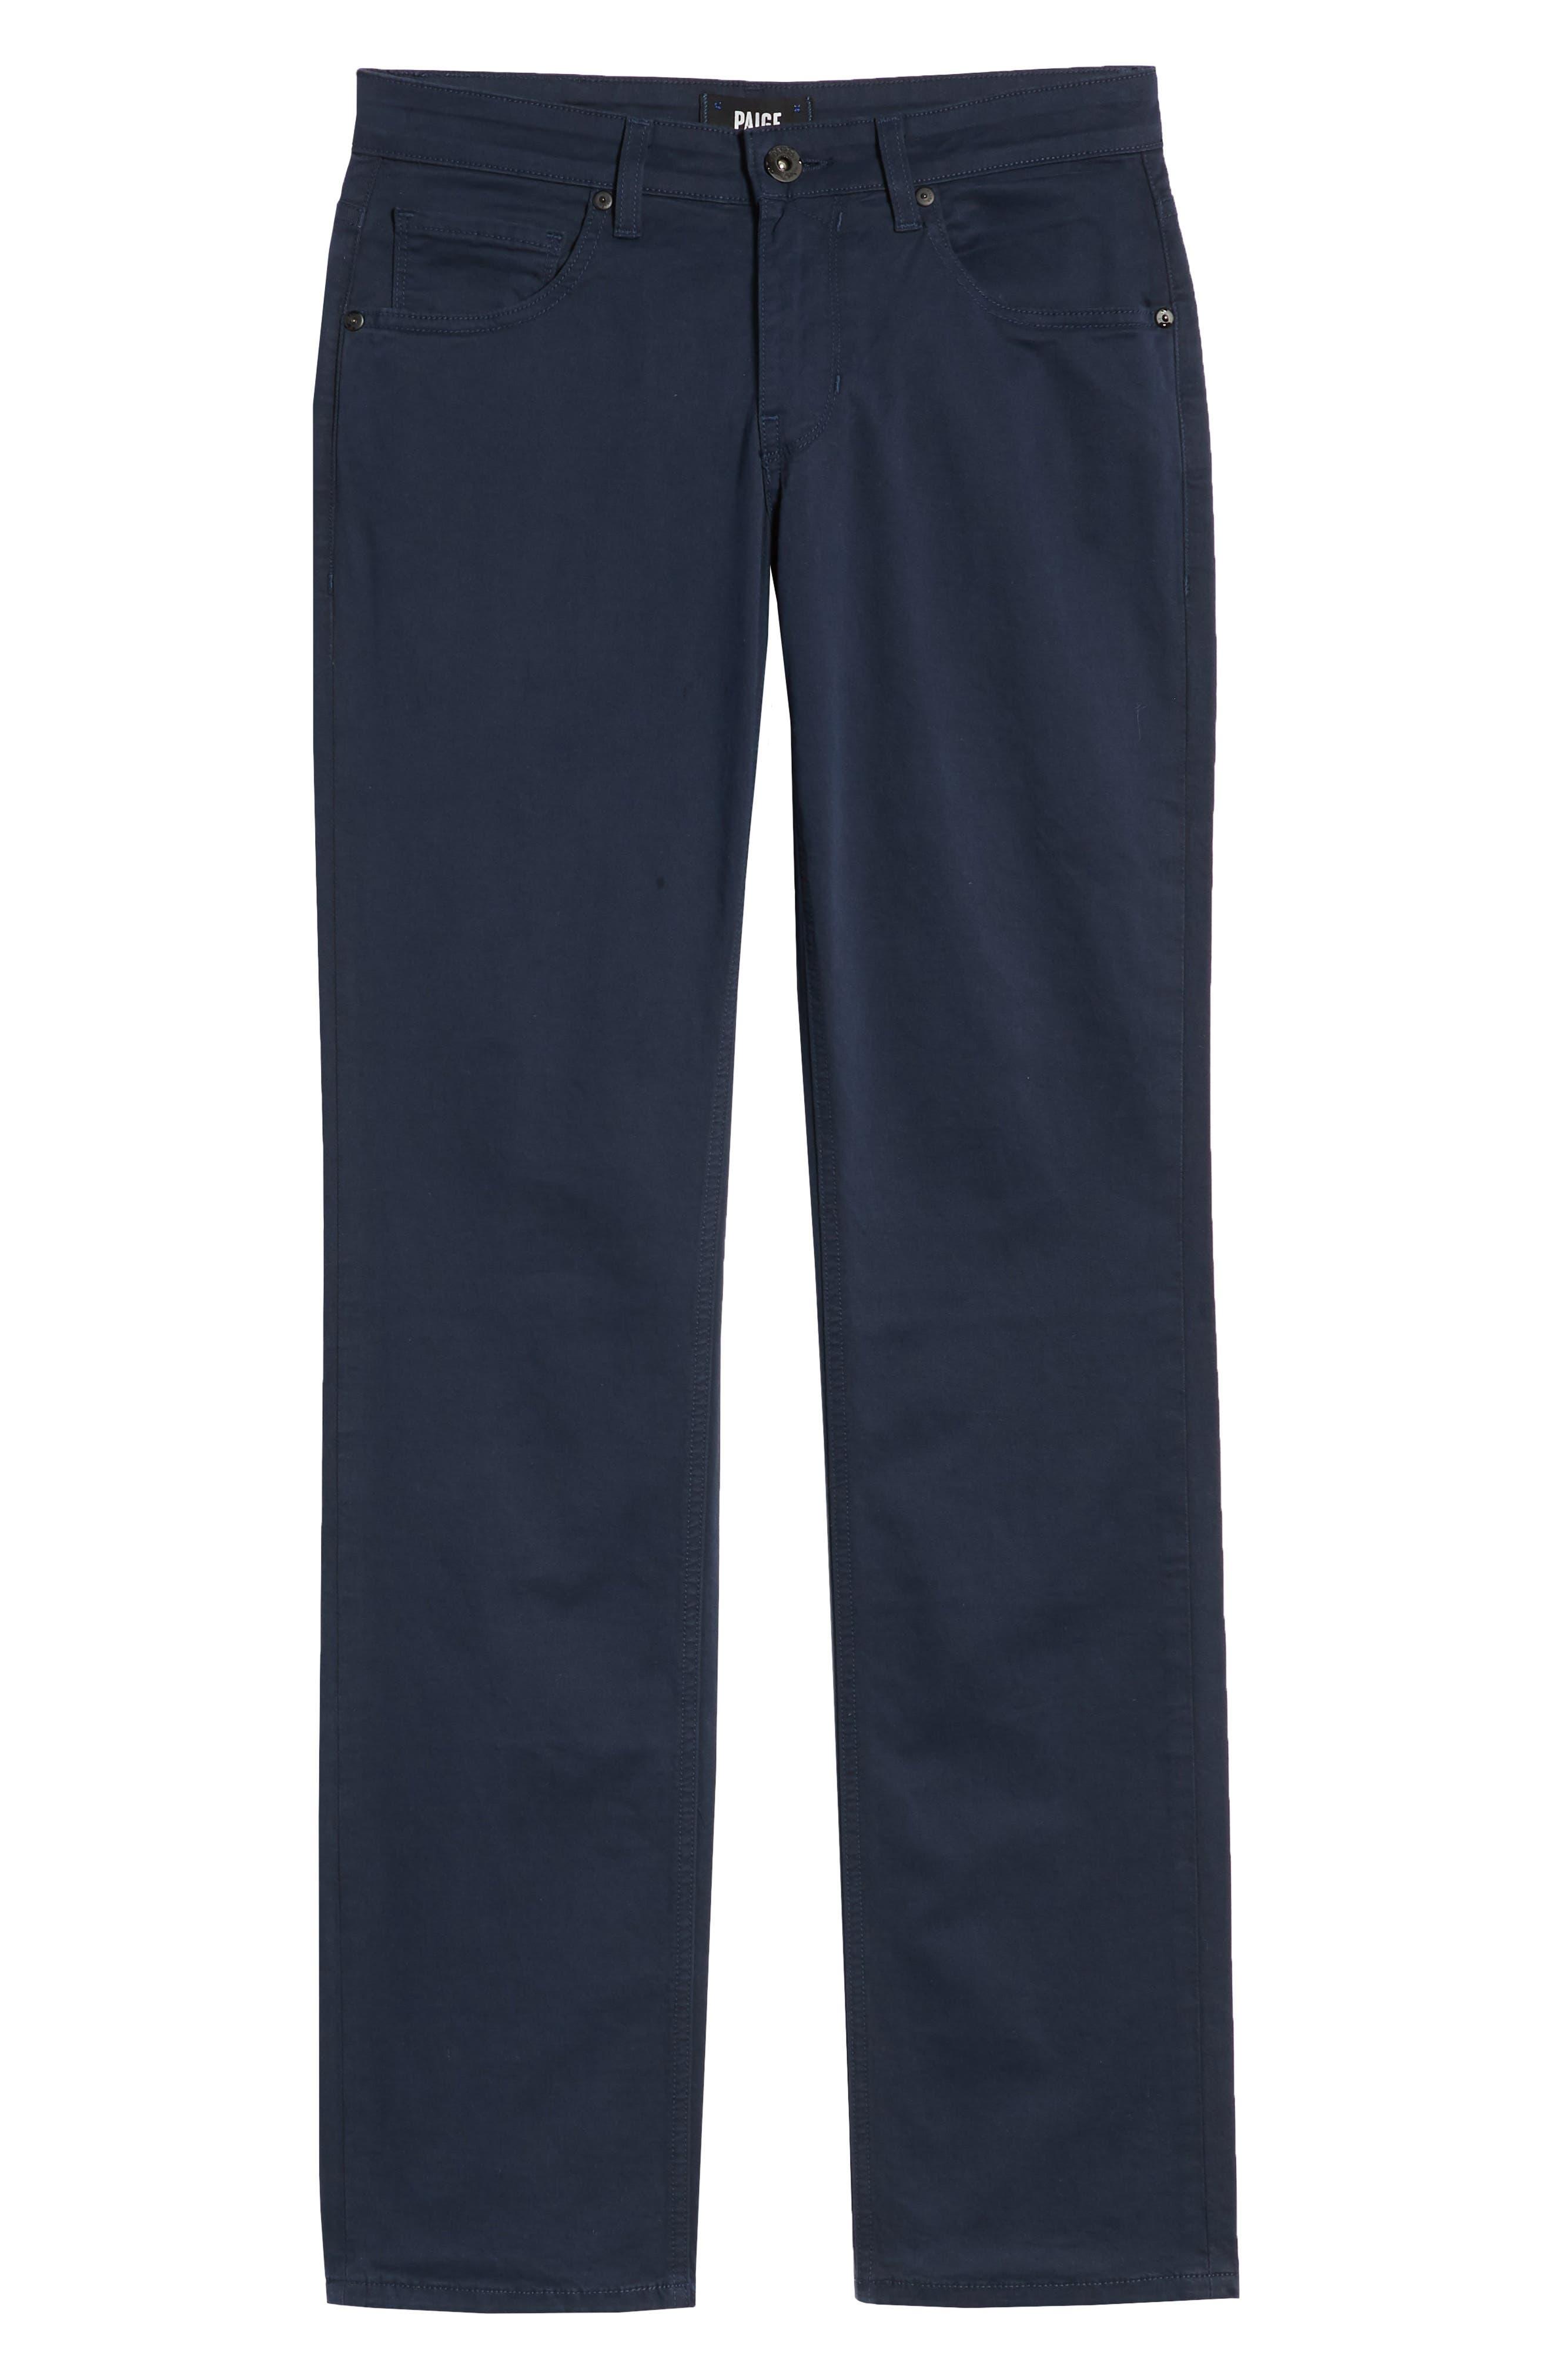 PAIGE, Normandie Slim Straight Leg Twill Pants, Alternate thumbnail 2, color, NAVY CADET